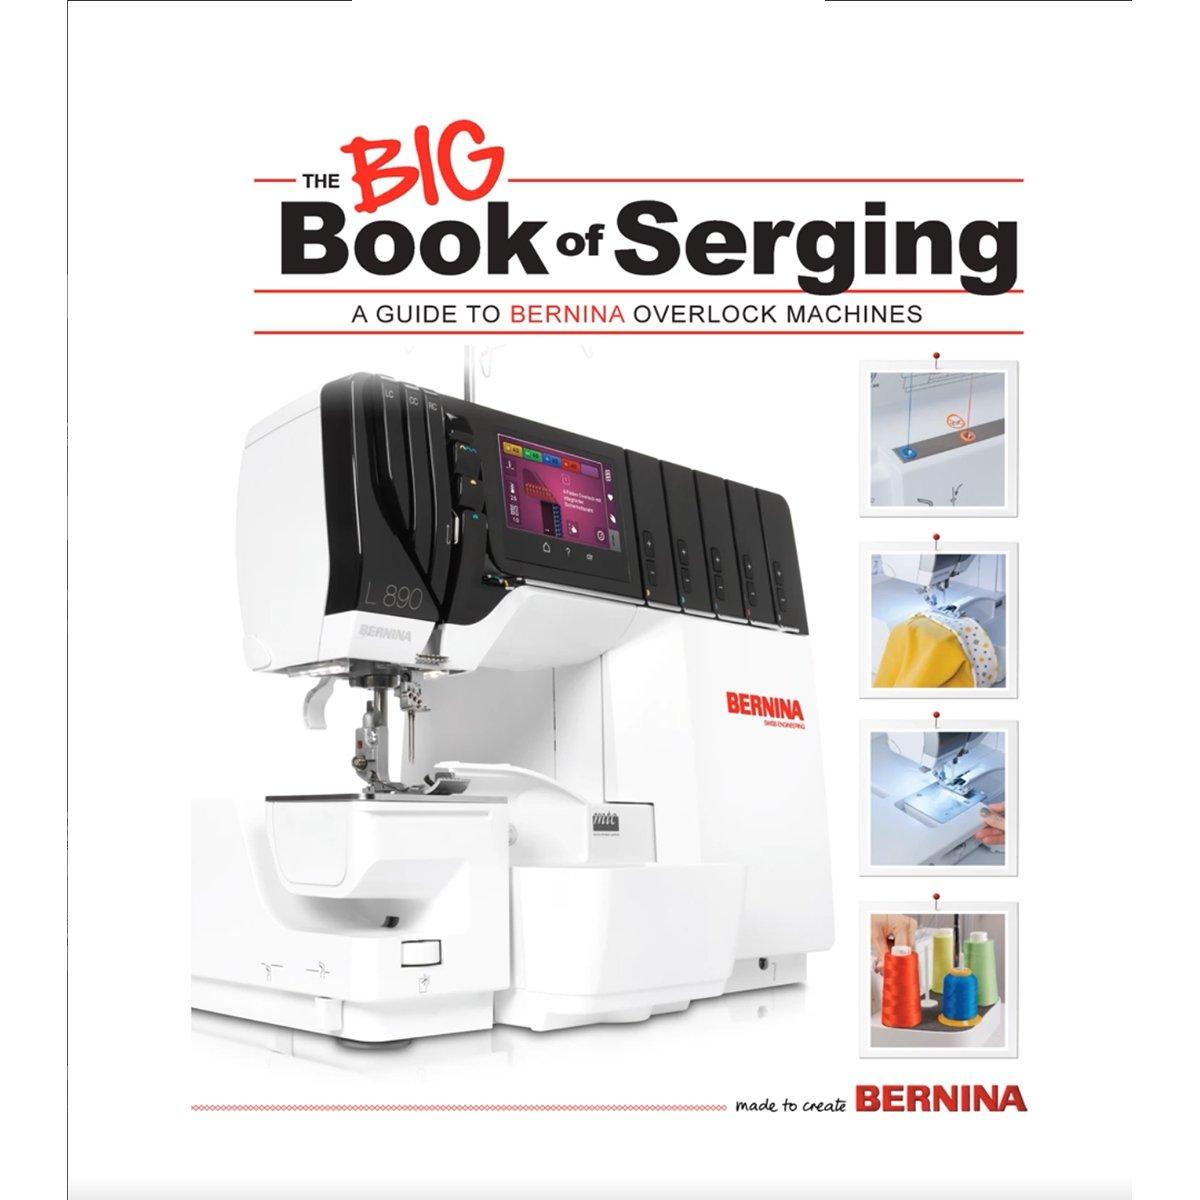 BERNINA- The Big Book of Serging